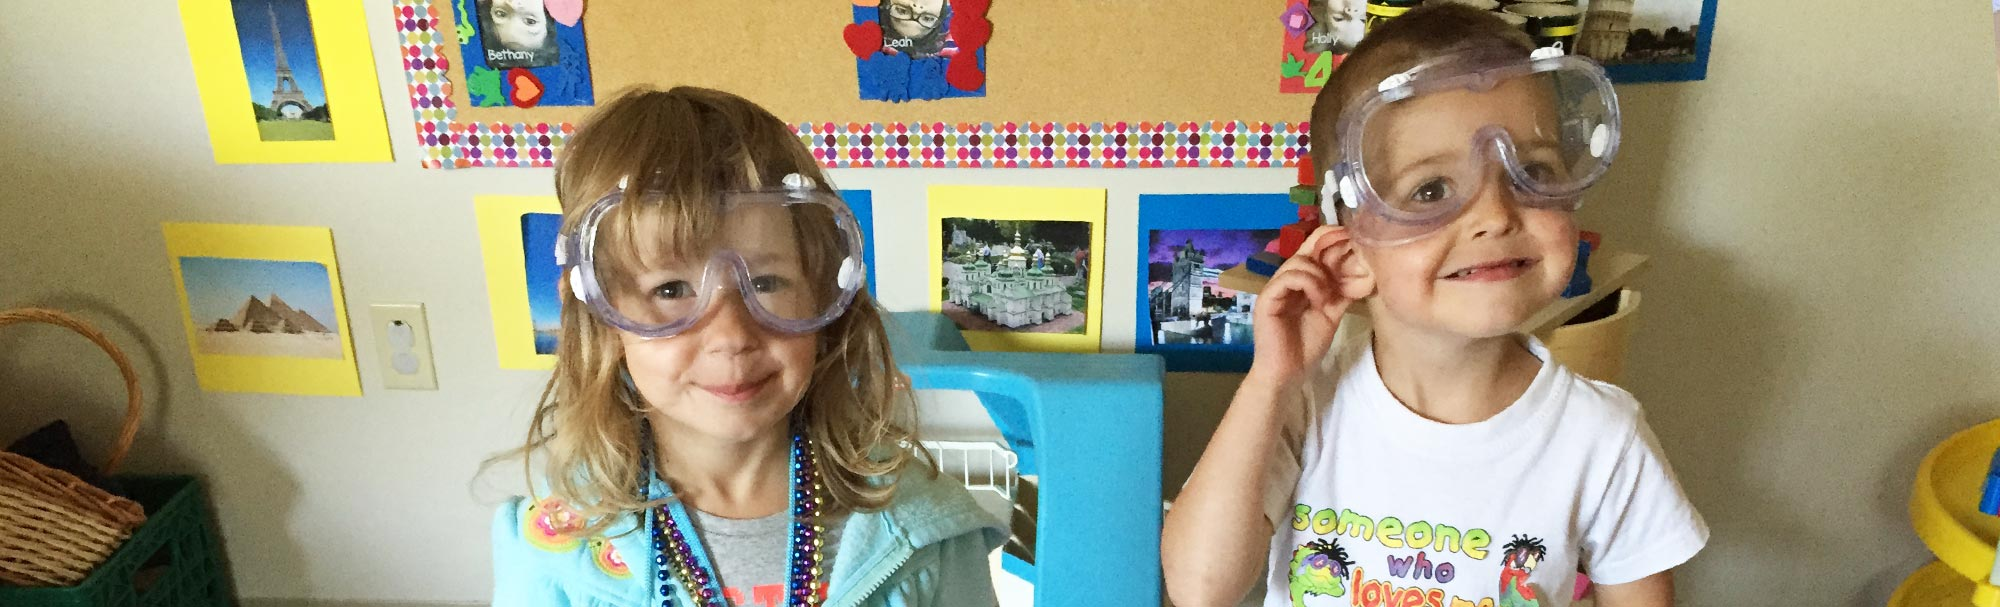 preschool-header-2